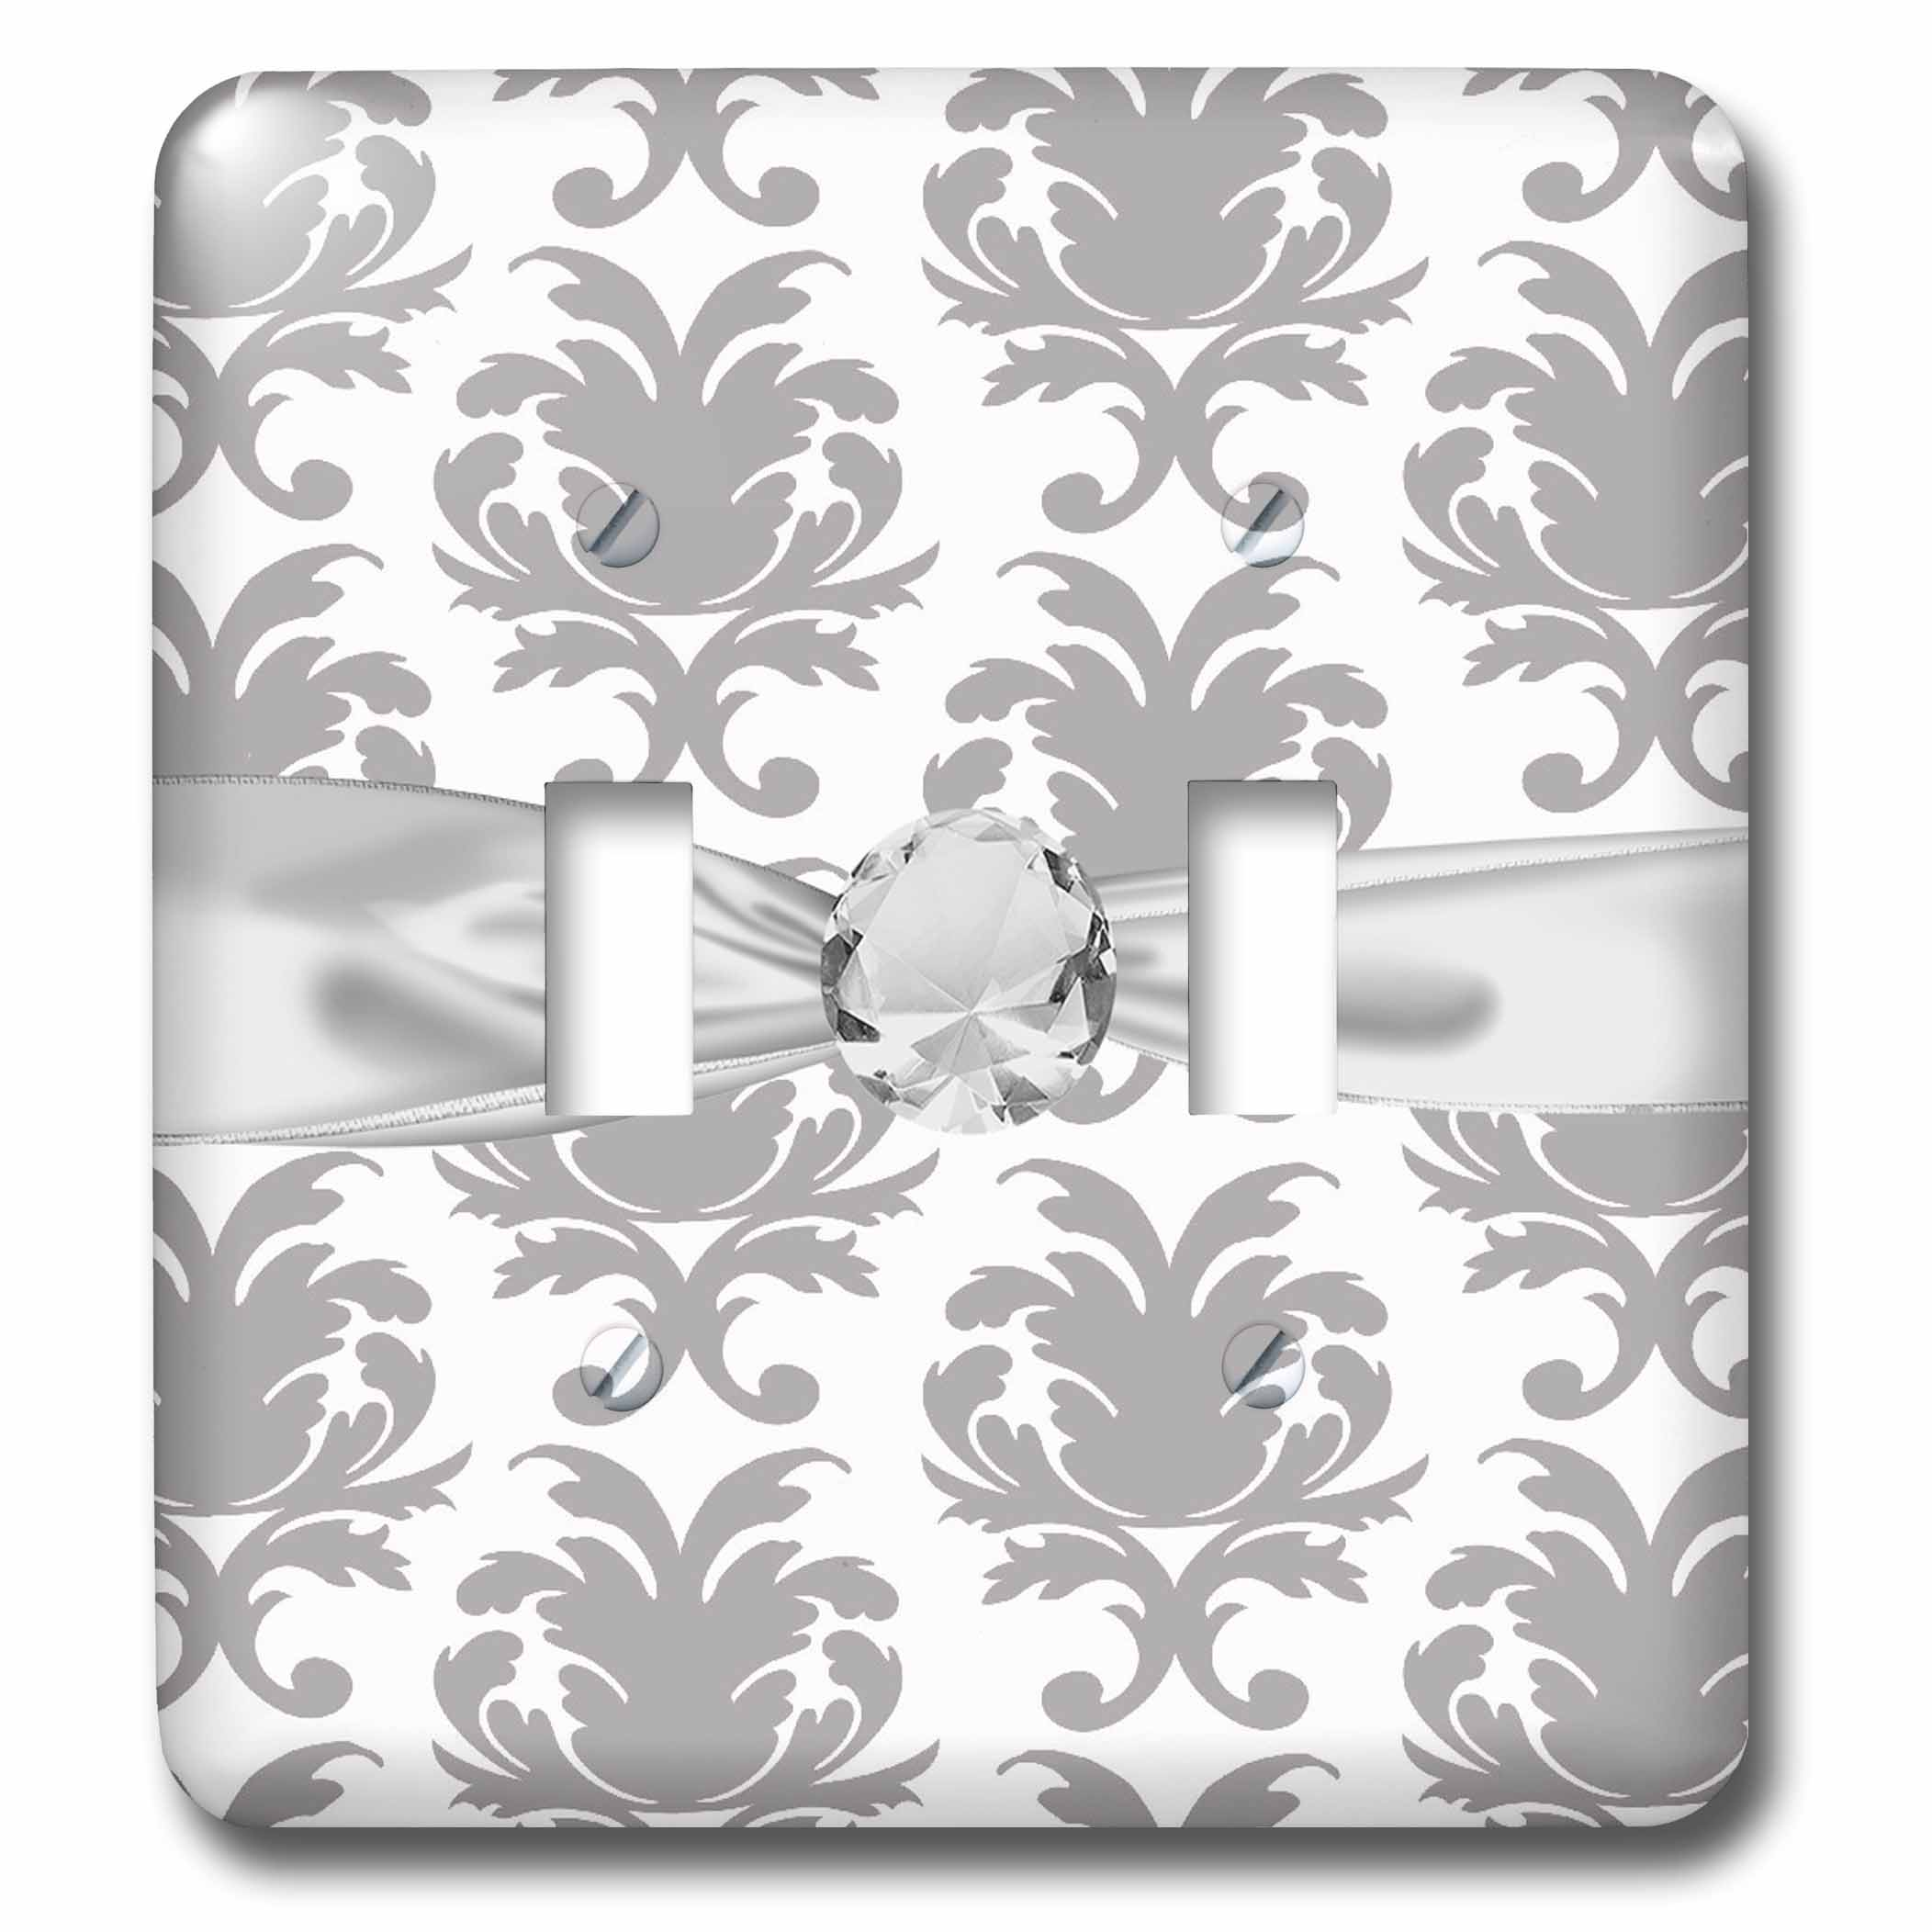 3drose Grey White Baroque Decorative Elegant Damask Pattern Faux Diamond Ribbon Double Toggle Switch Lsp 118974 2 Walmart Com Walmart Com